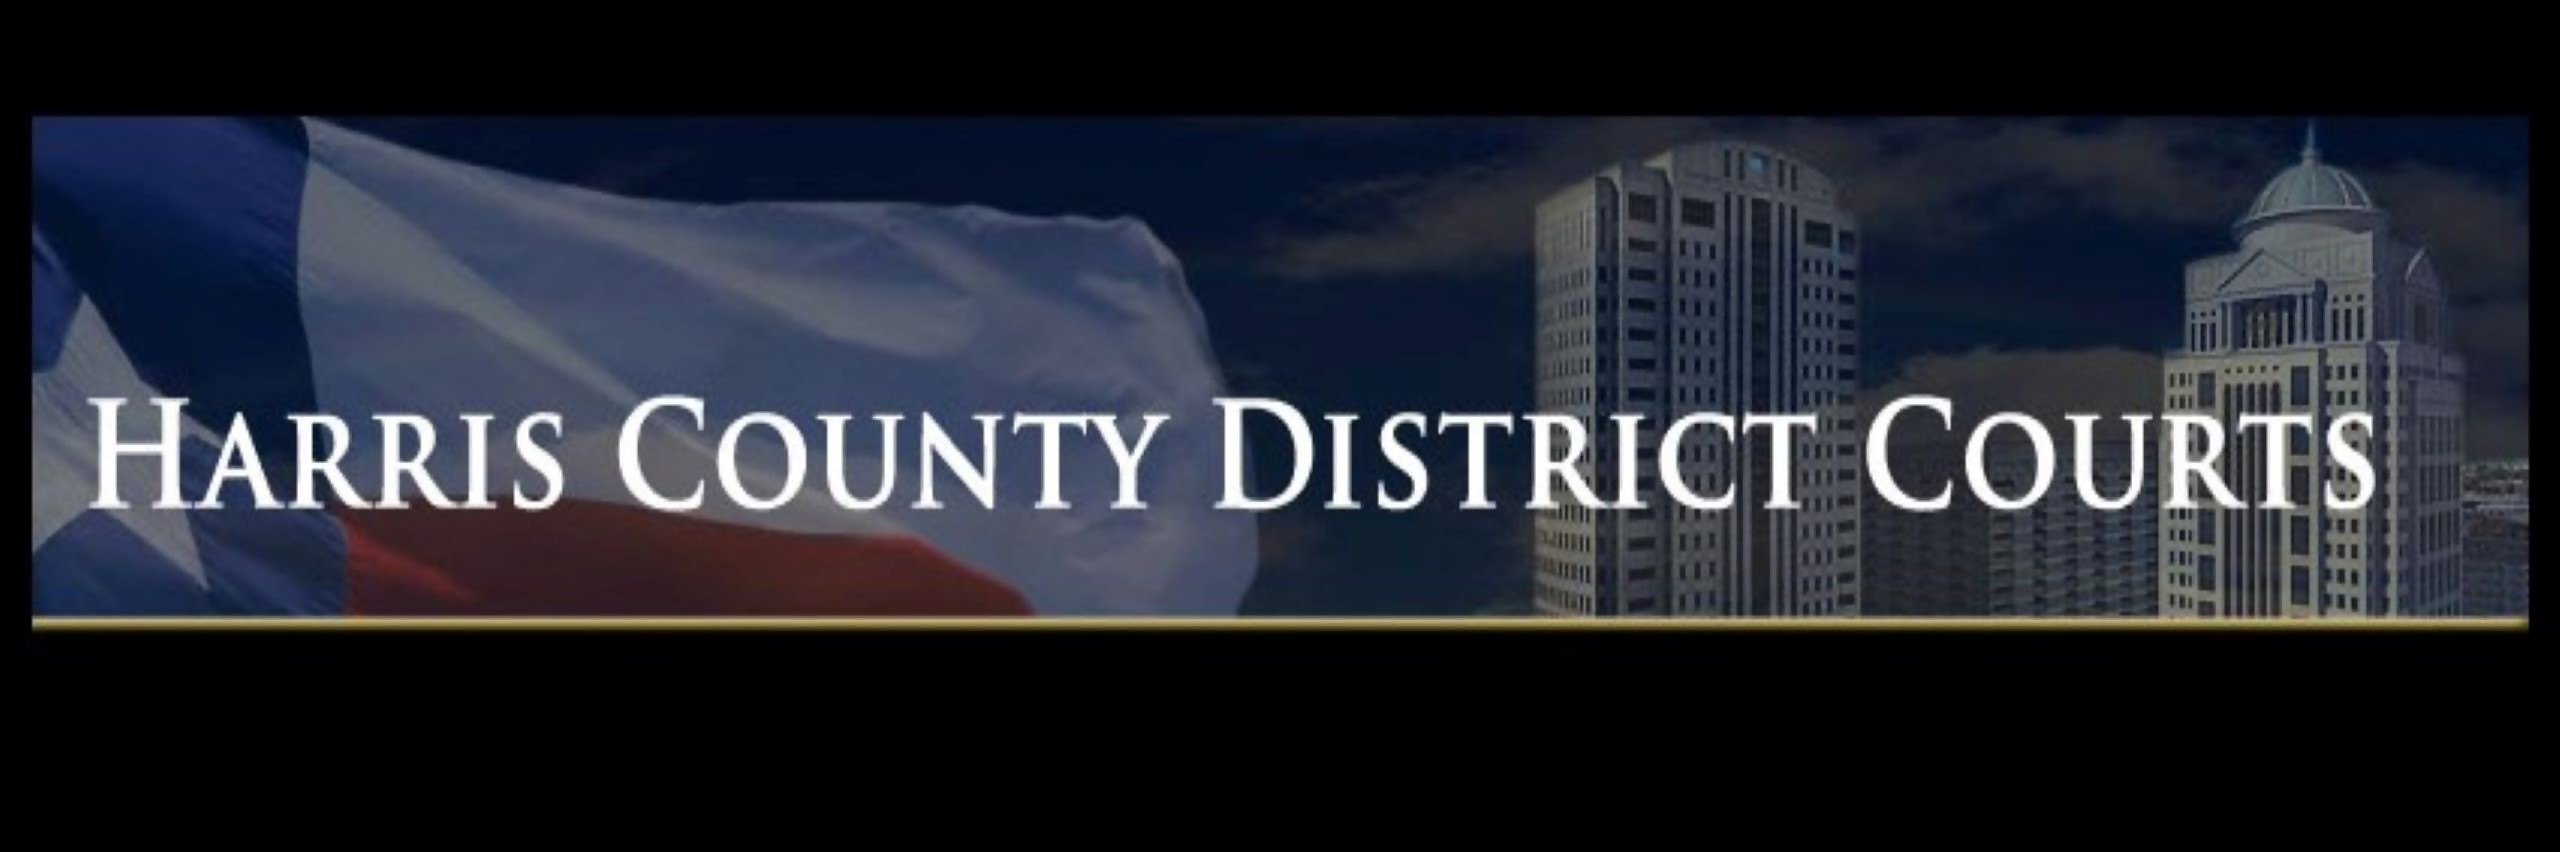 178th District Court - Live Stream